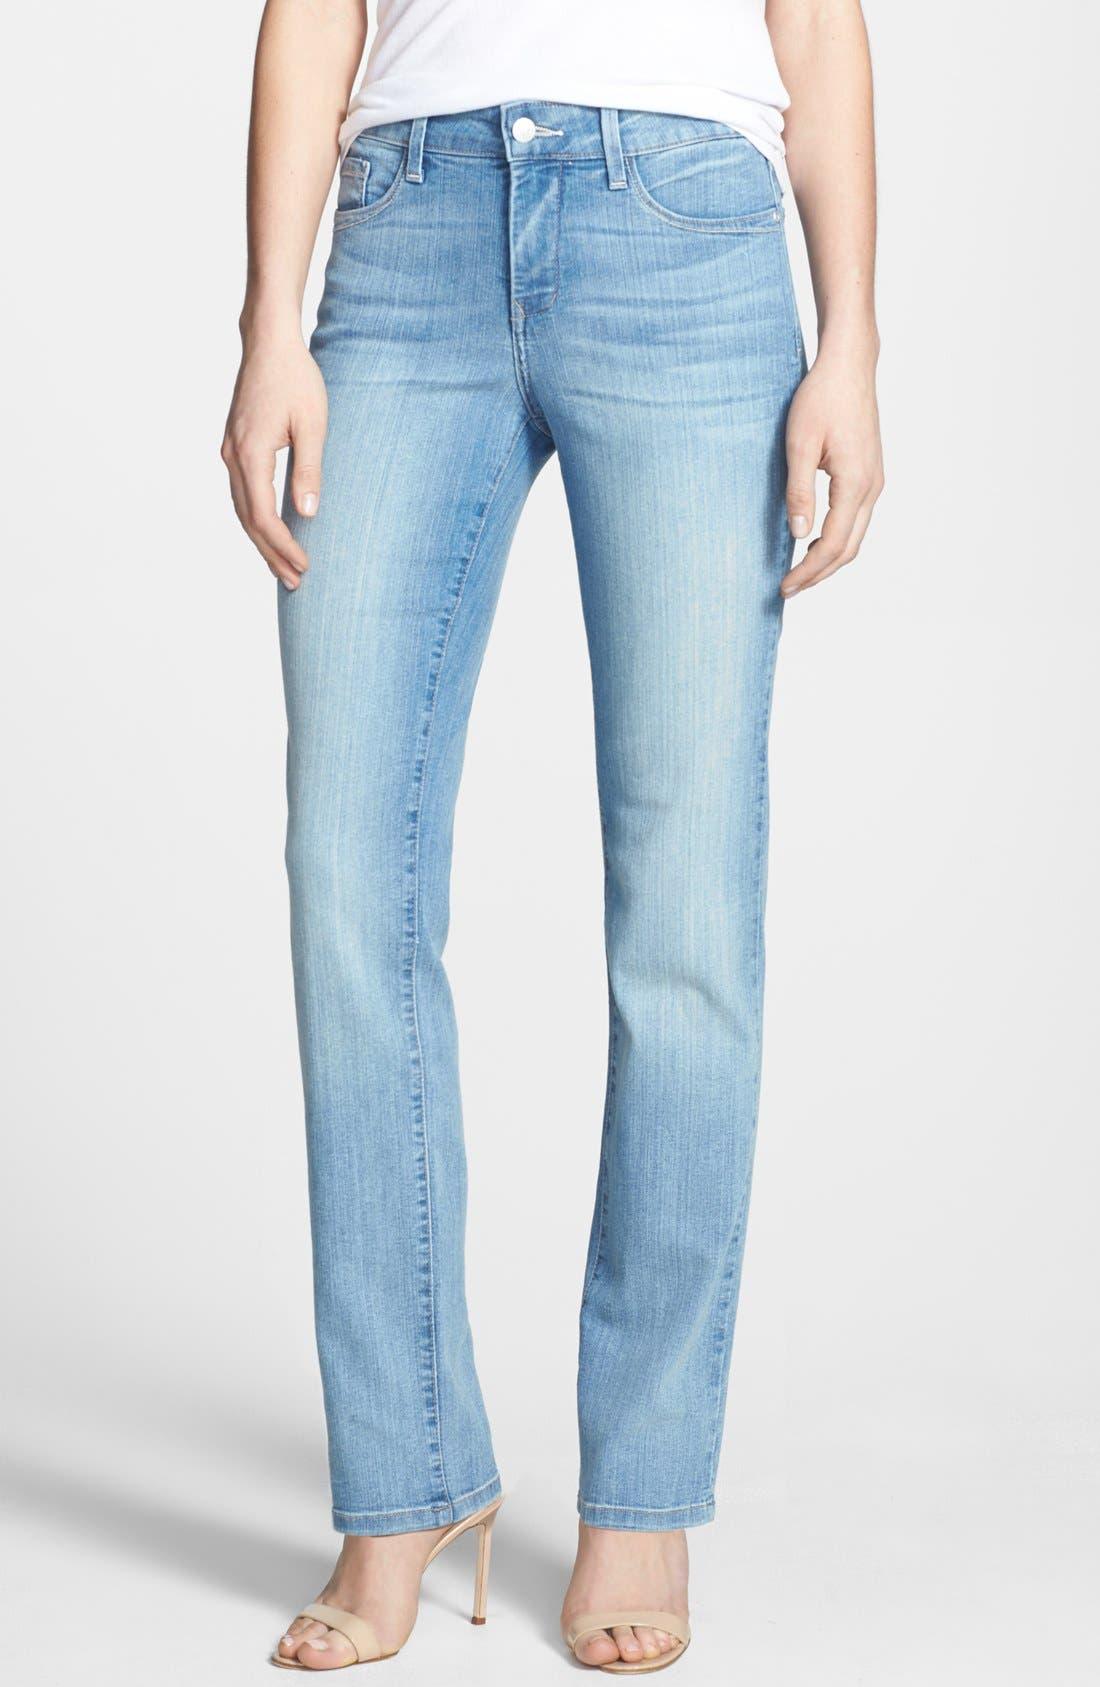 Alternate Image 1 Selected - NYDJ 'Sheri' Stretch Skinny Jeans (Manhattan Beach)